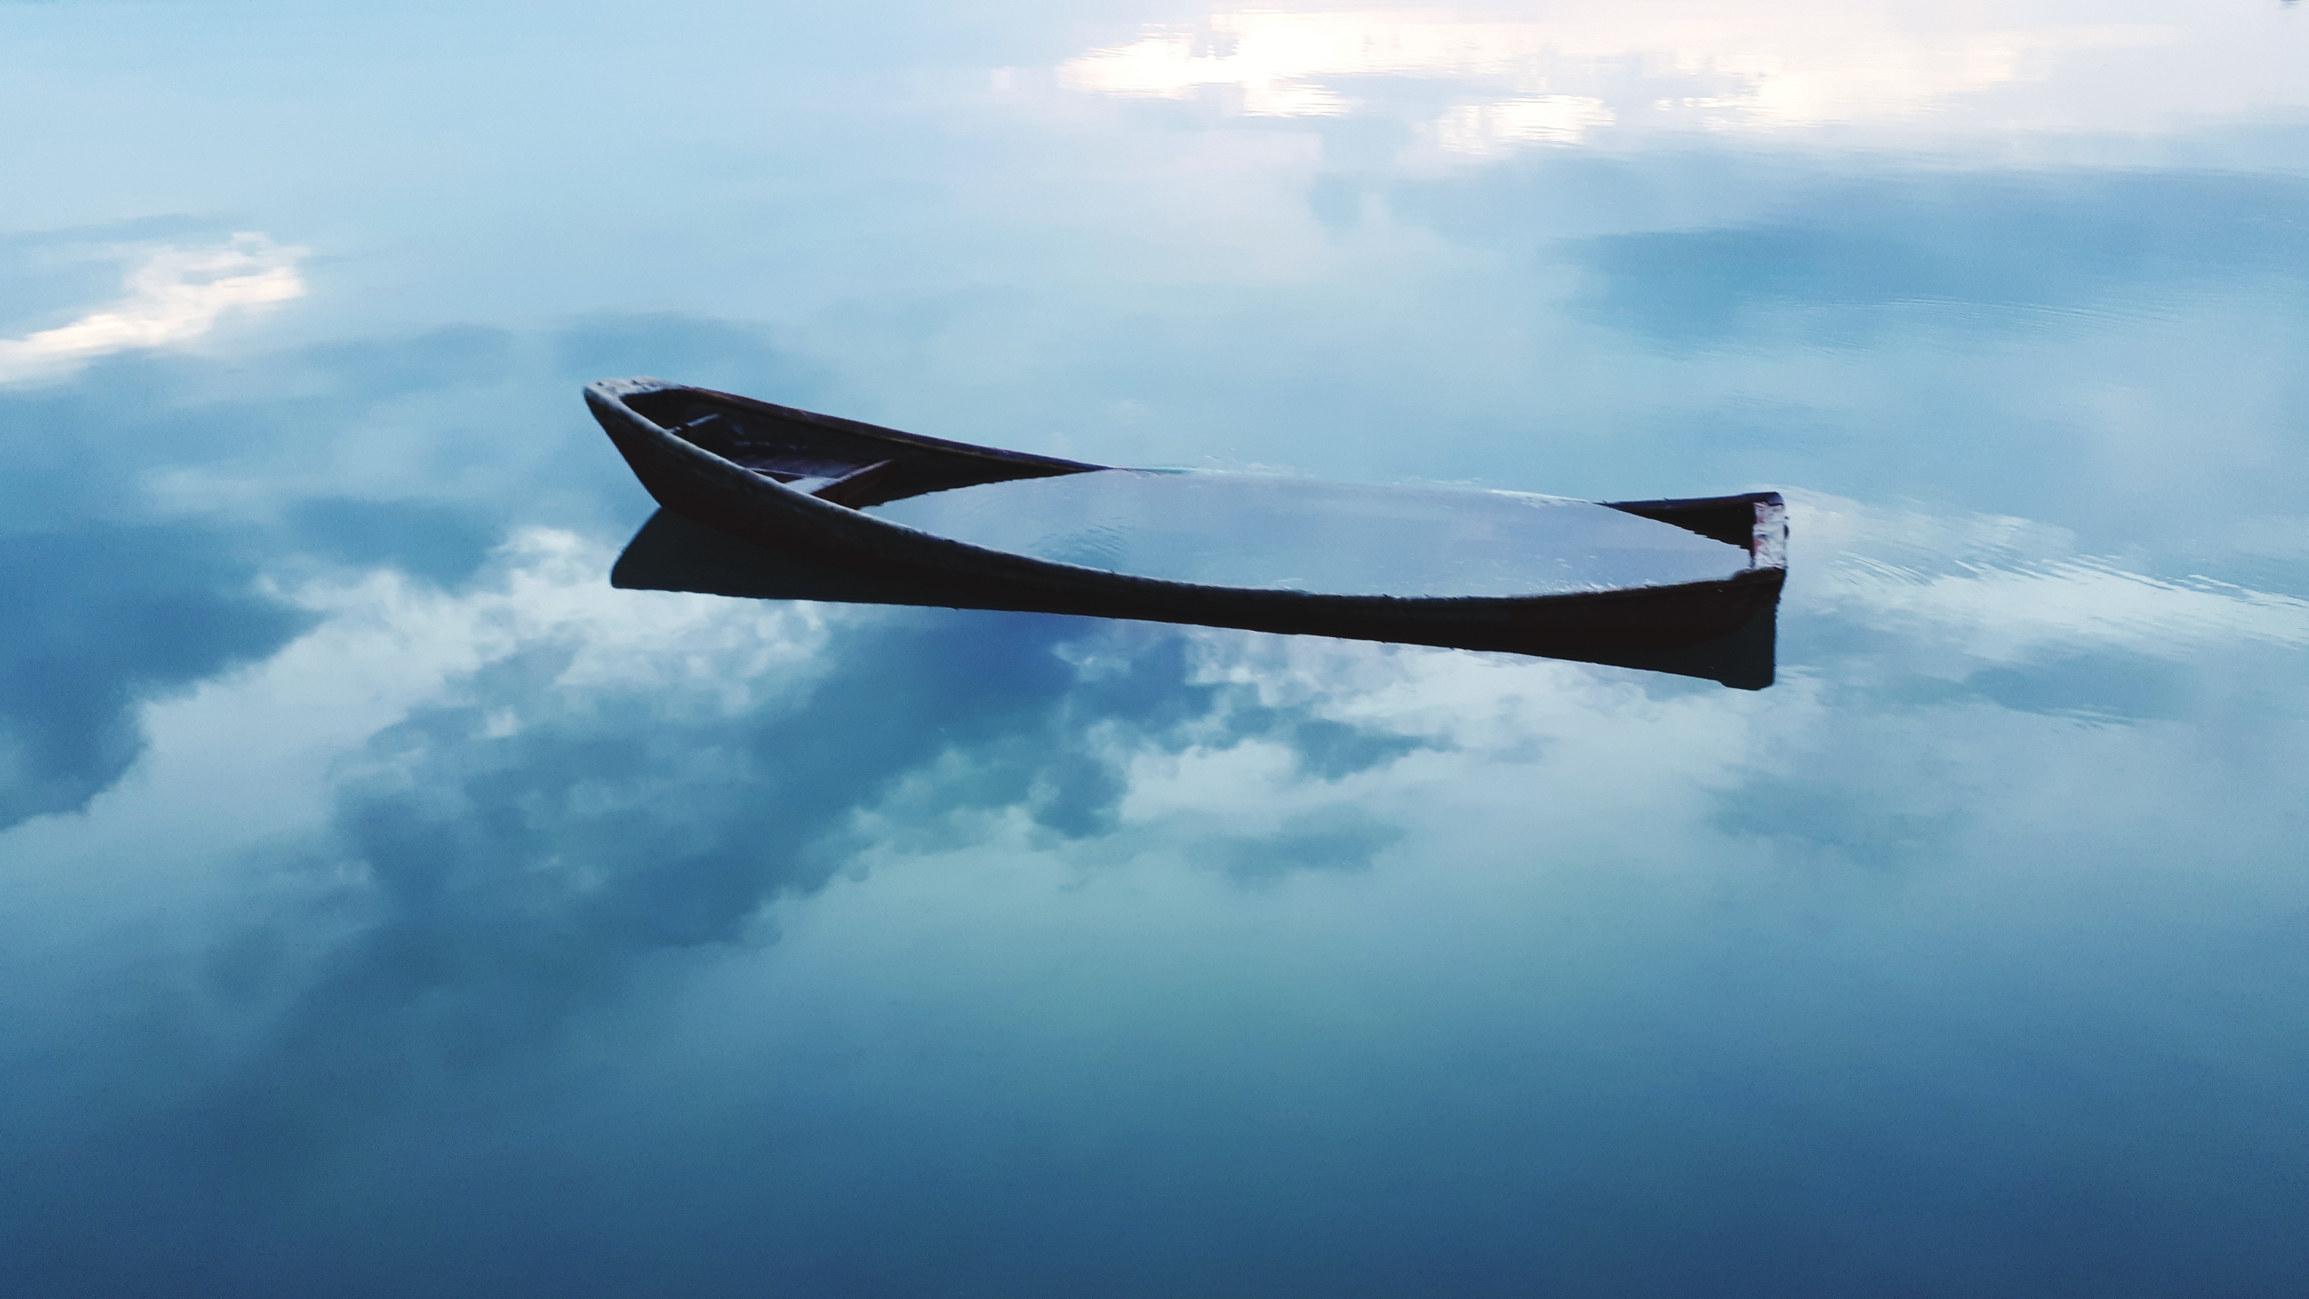 A sinking boat